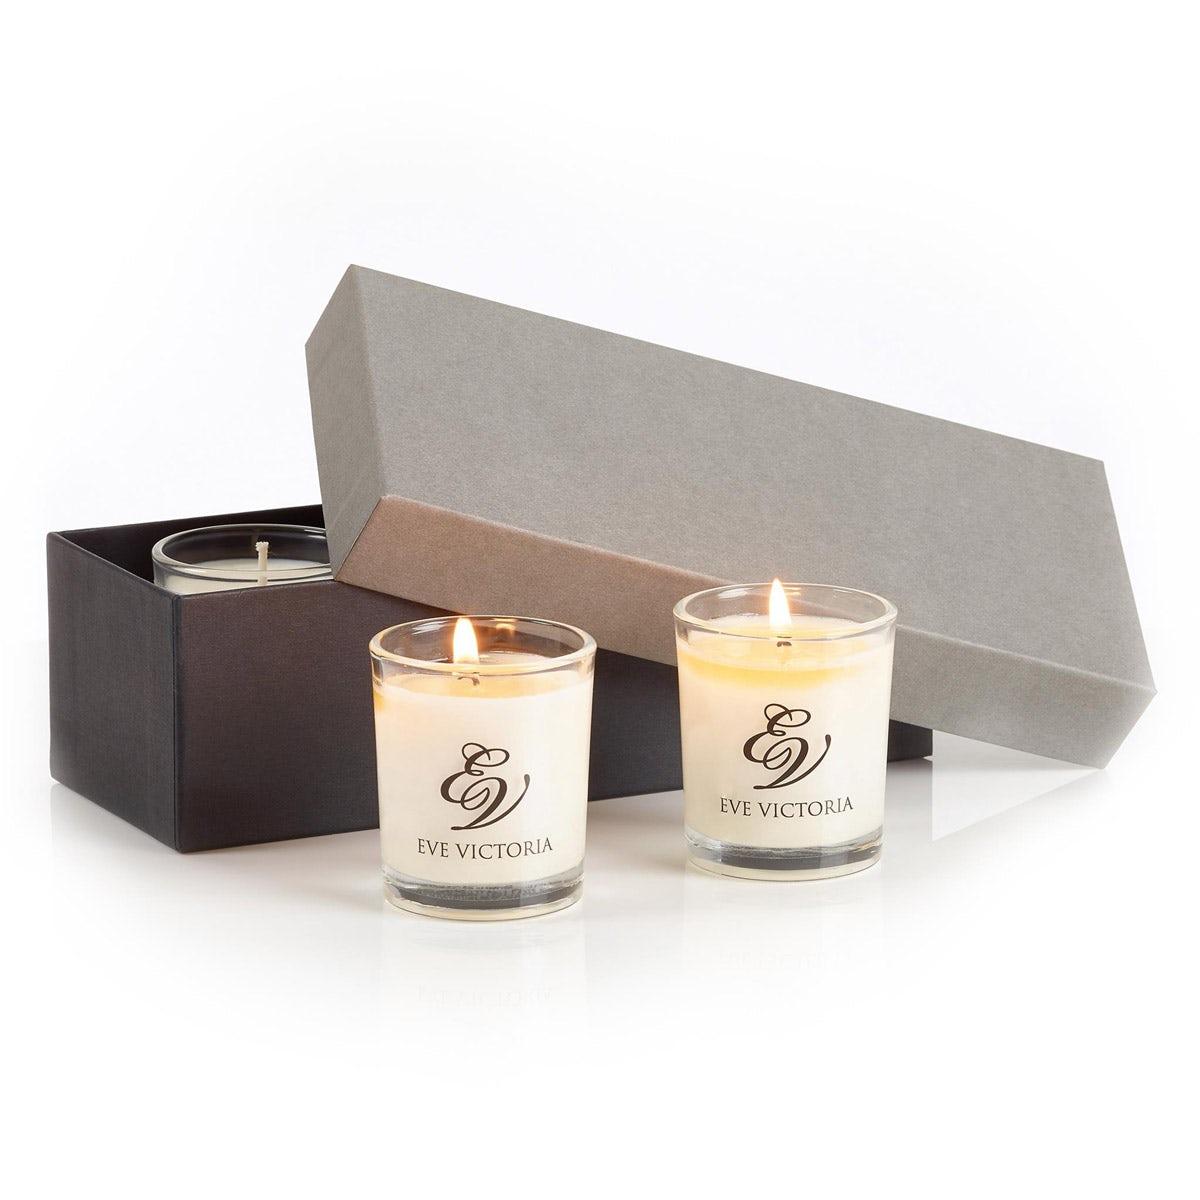 Eve Victoria Oud & bergamot 3 Votive gift box 9cl